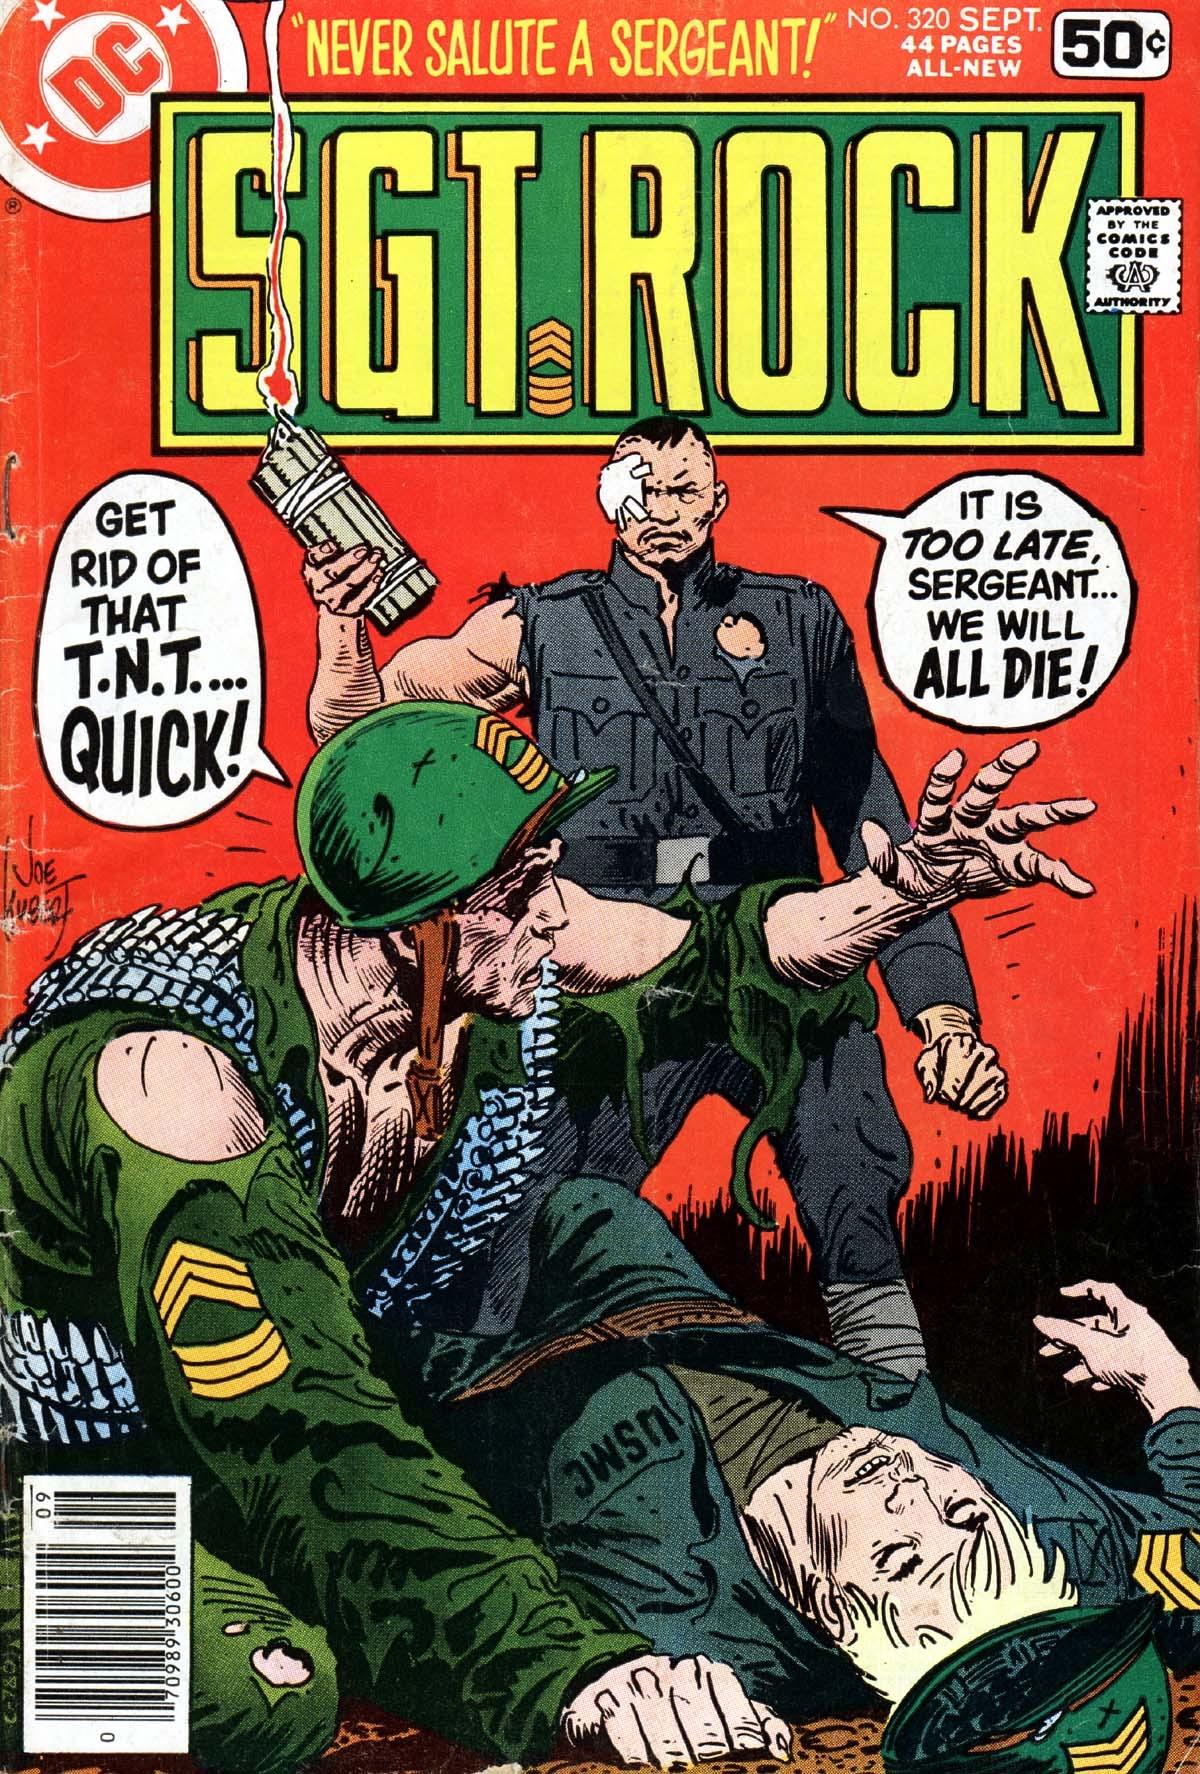 Read online Sgt. Rock comic -  Issue #320 - 1